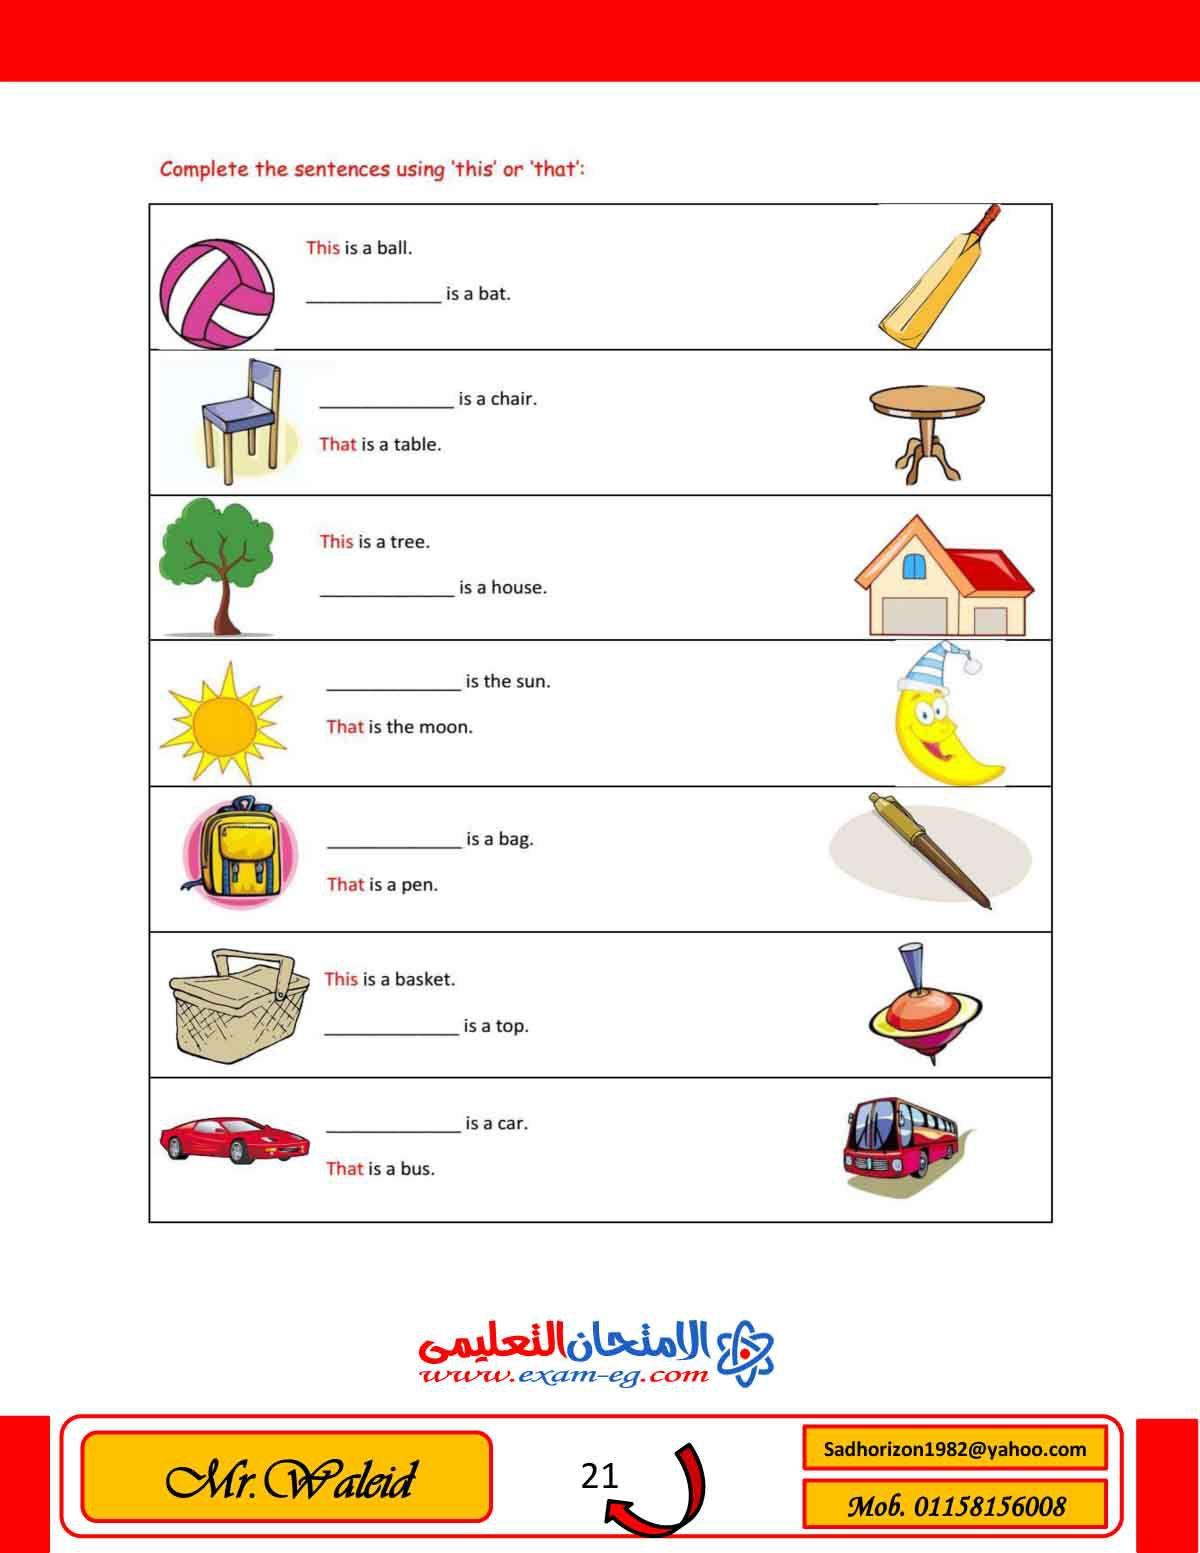 exam-eg.com_1449405428361.jpg